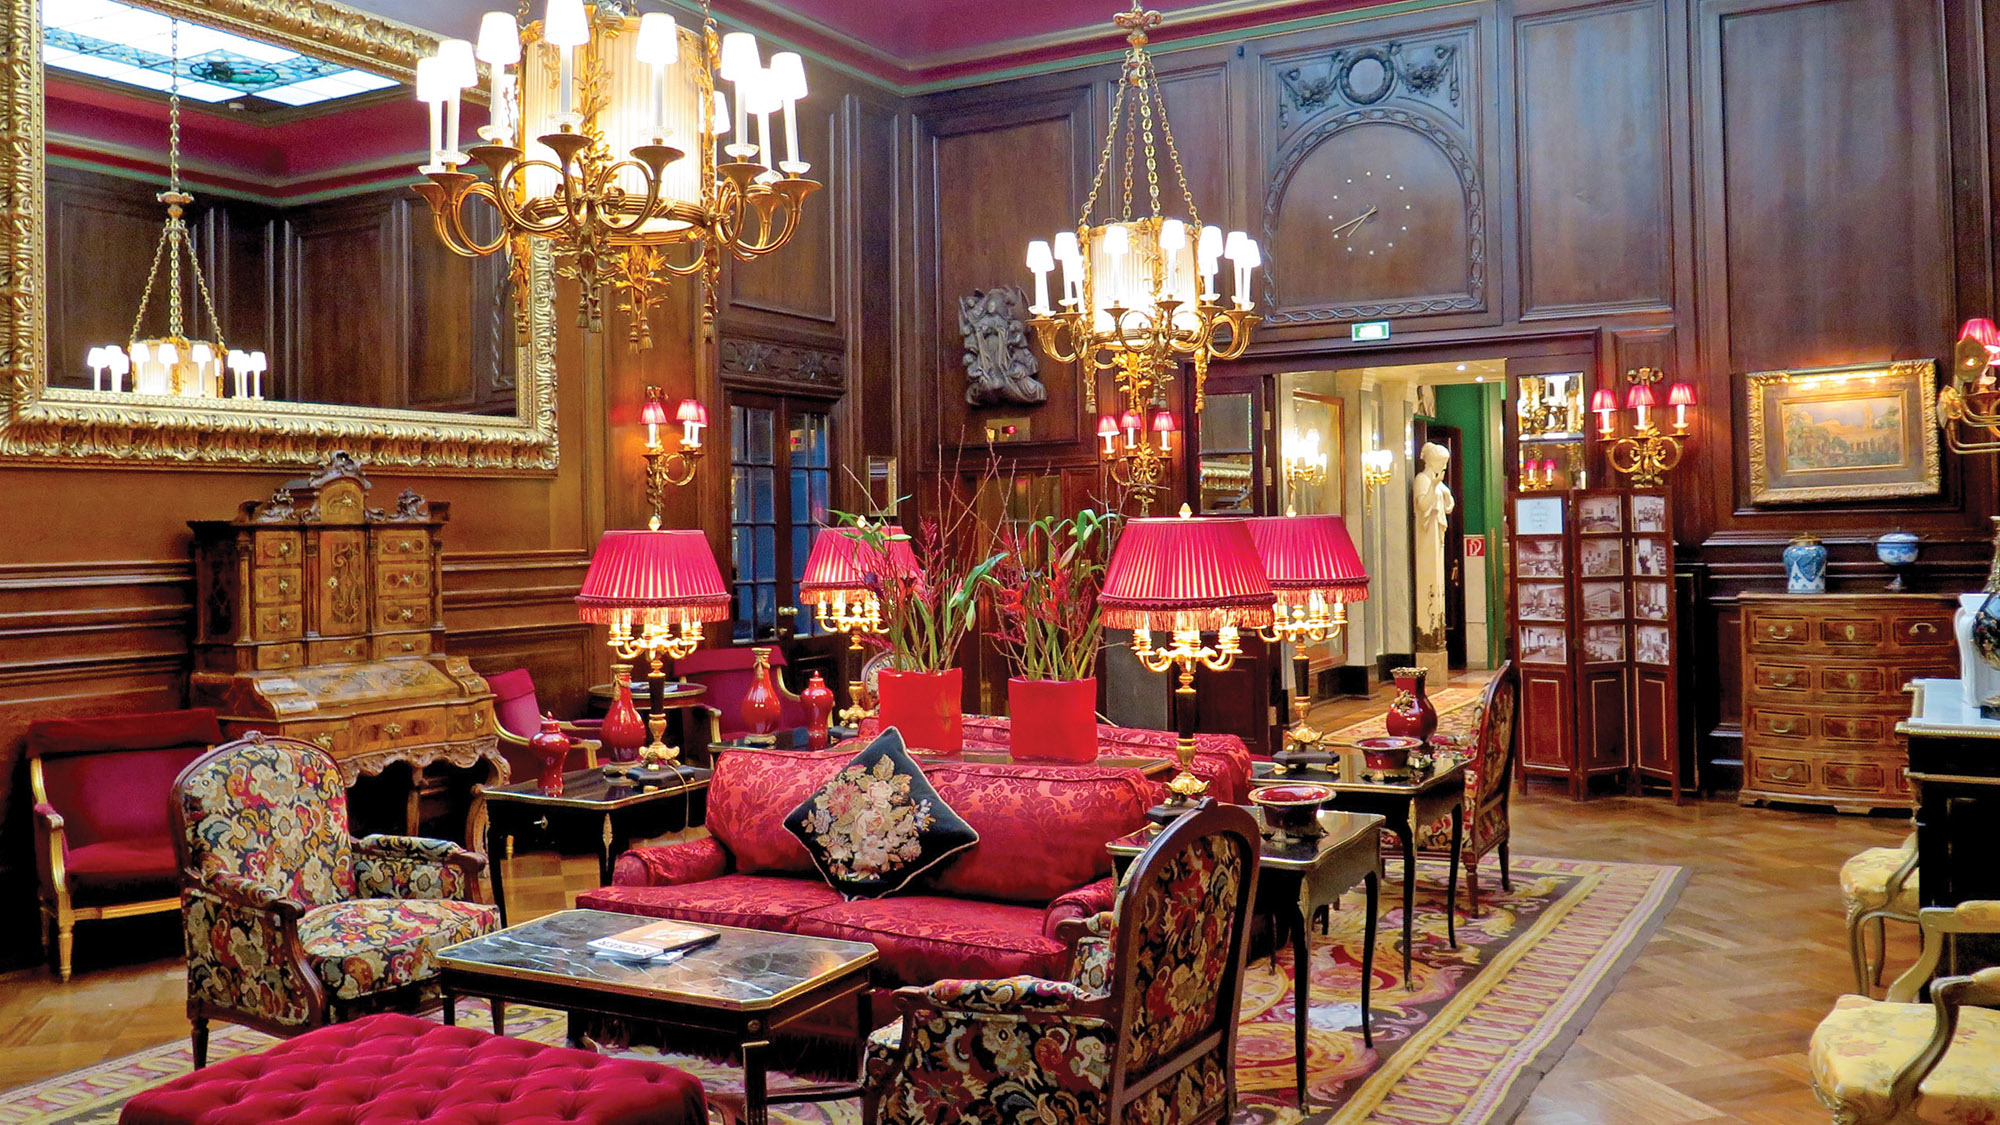 Vienna' Hotel Sacher Slice Of Sweet Life Travel Weekly